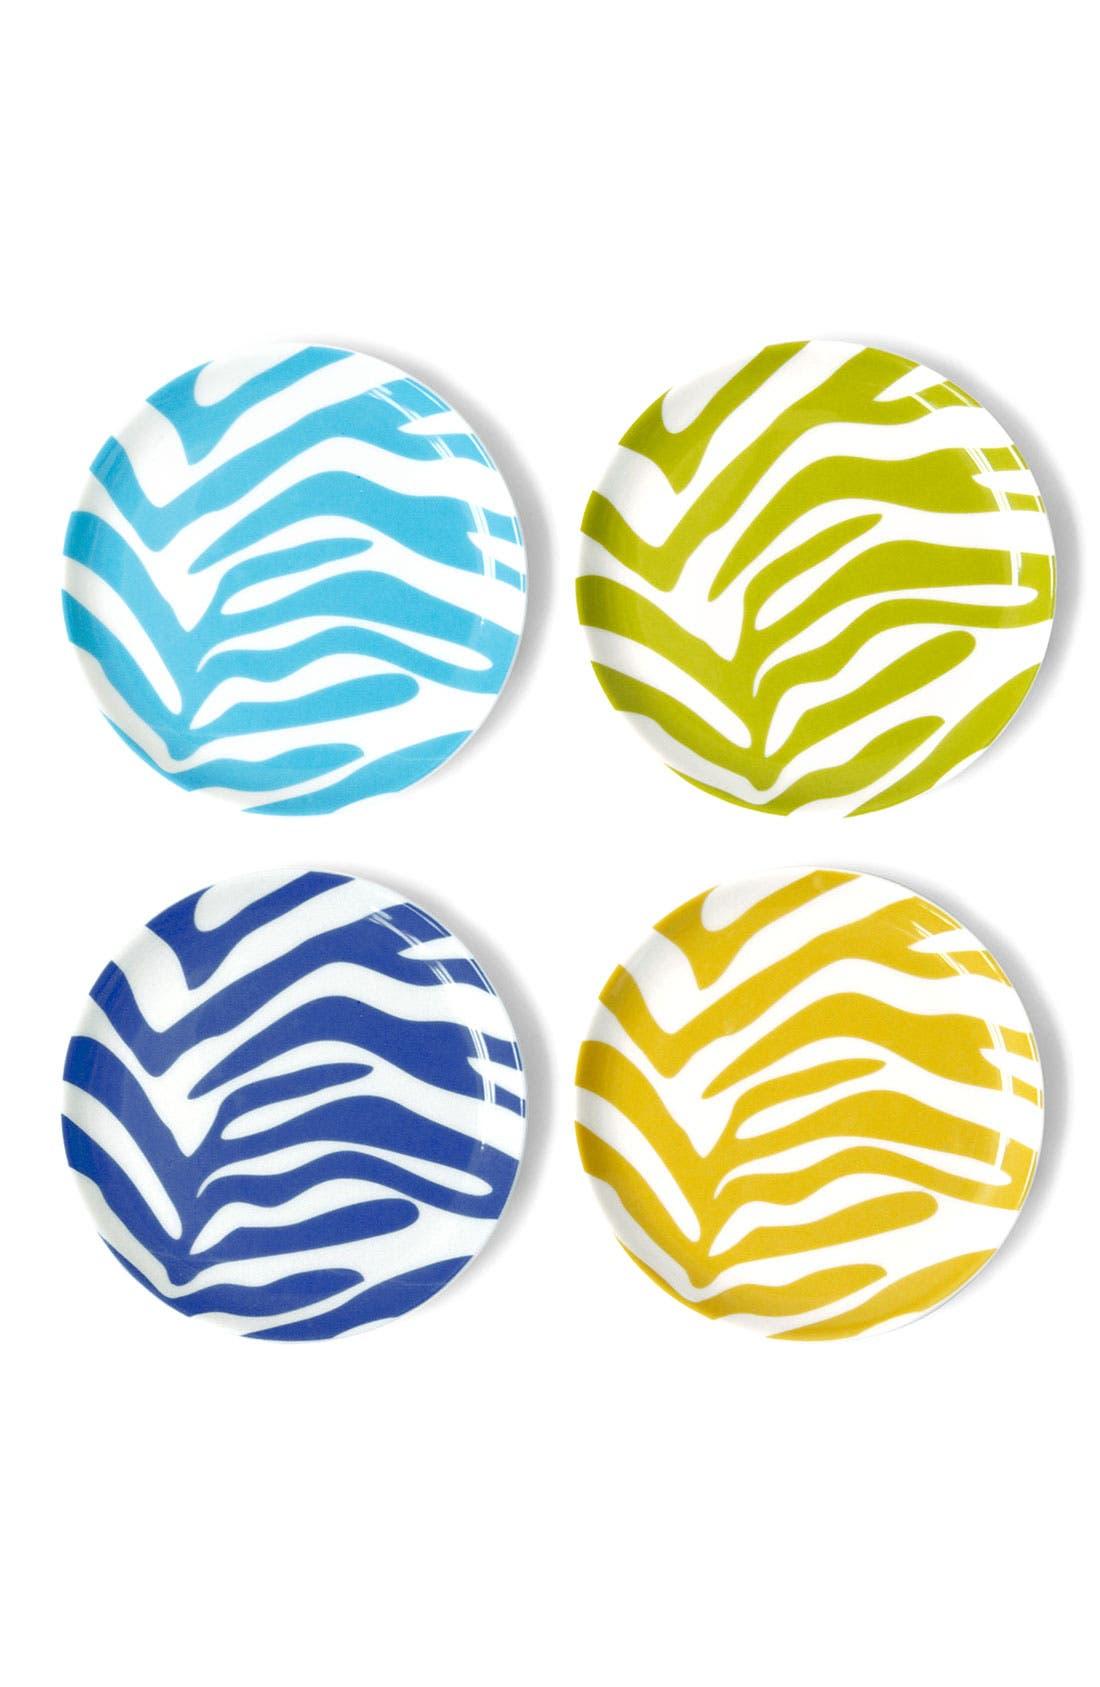 Main Image - Jonathan Adler 'Zebra' Porcelain Coasters